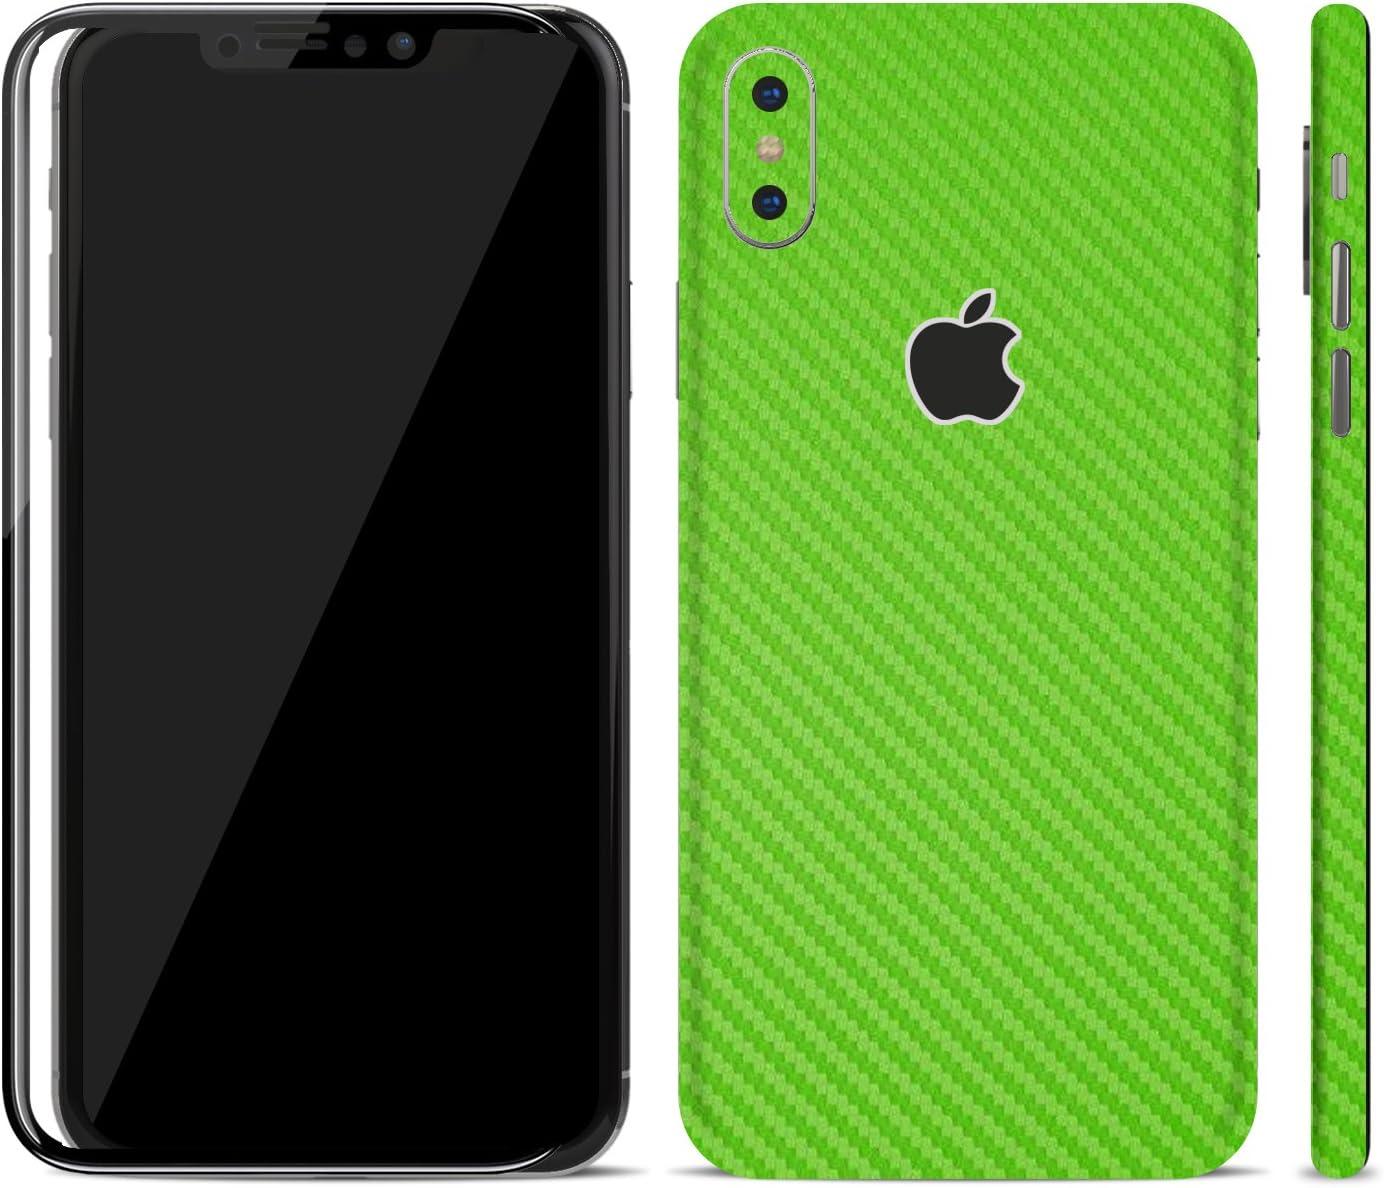 iPhone X Skin, Jungle Green Gloss iPhone X 10 Textured Skin Sticker